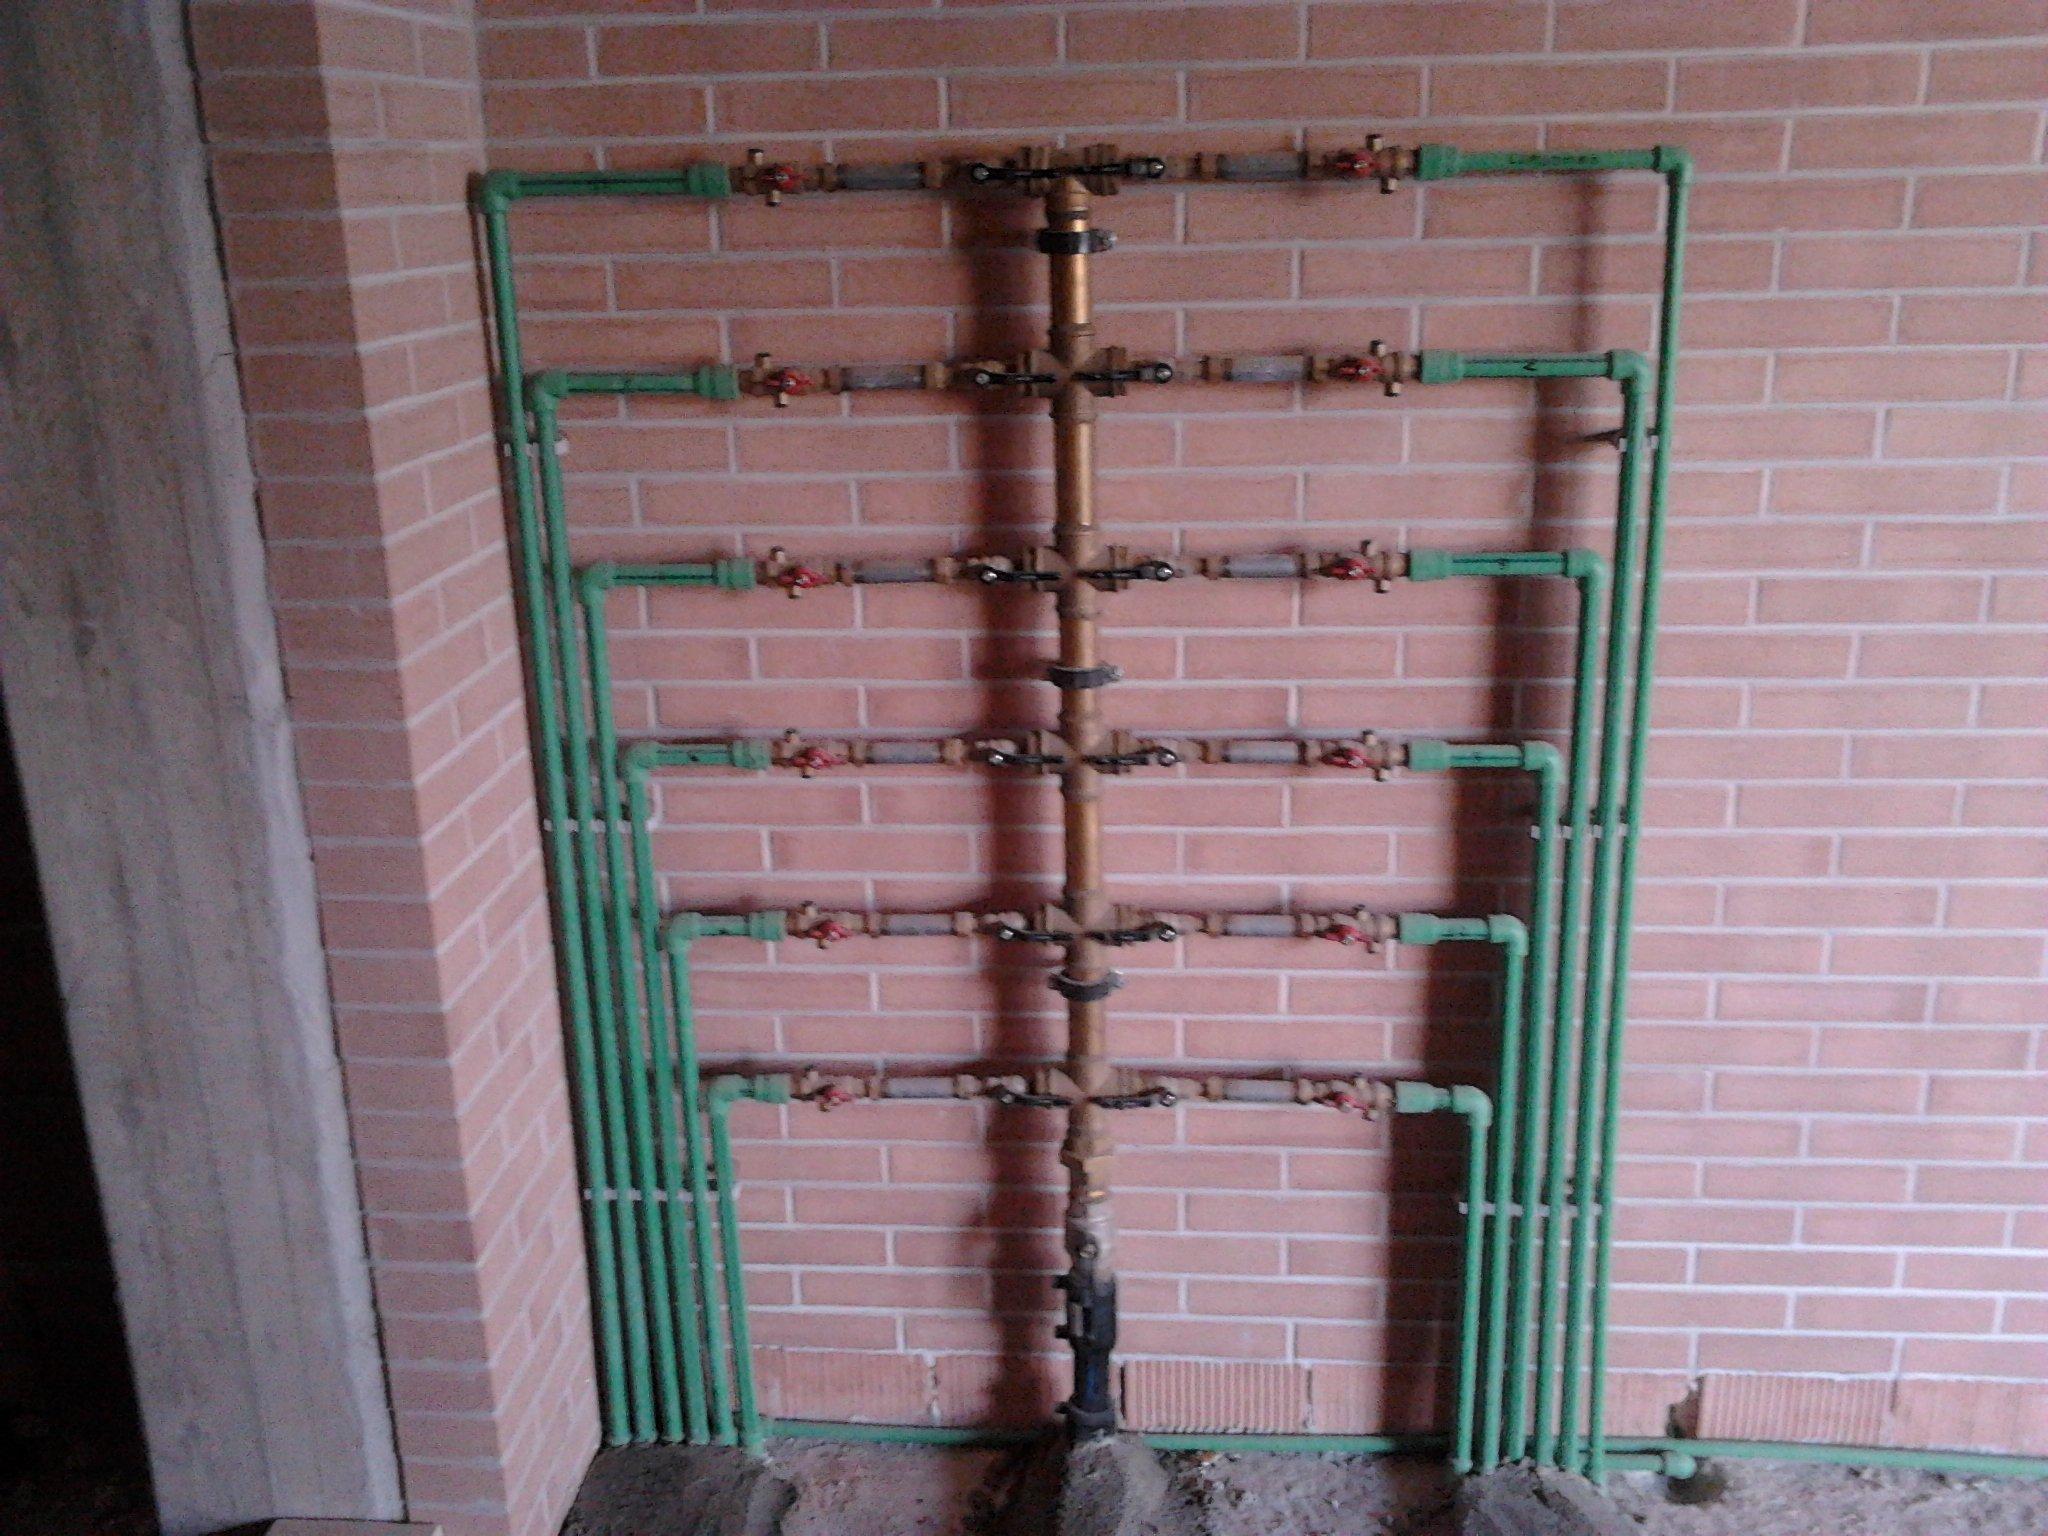 tubi verdi in un muro